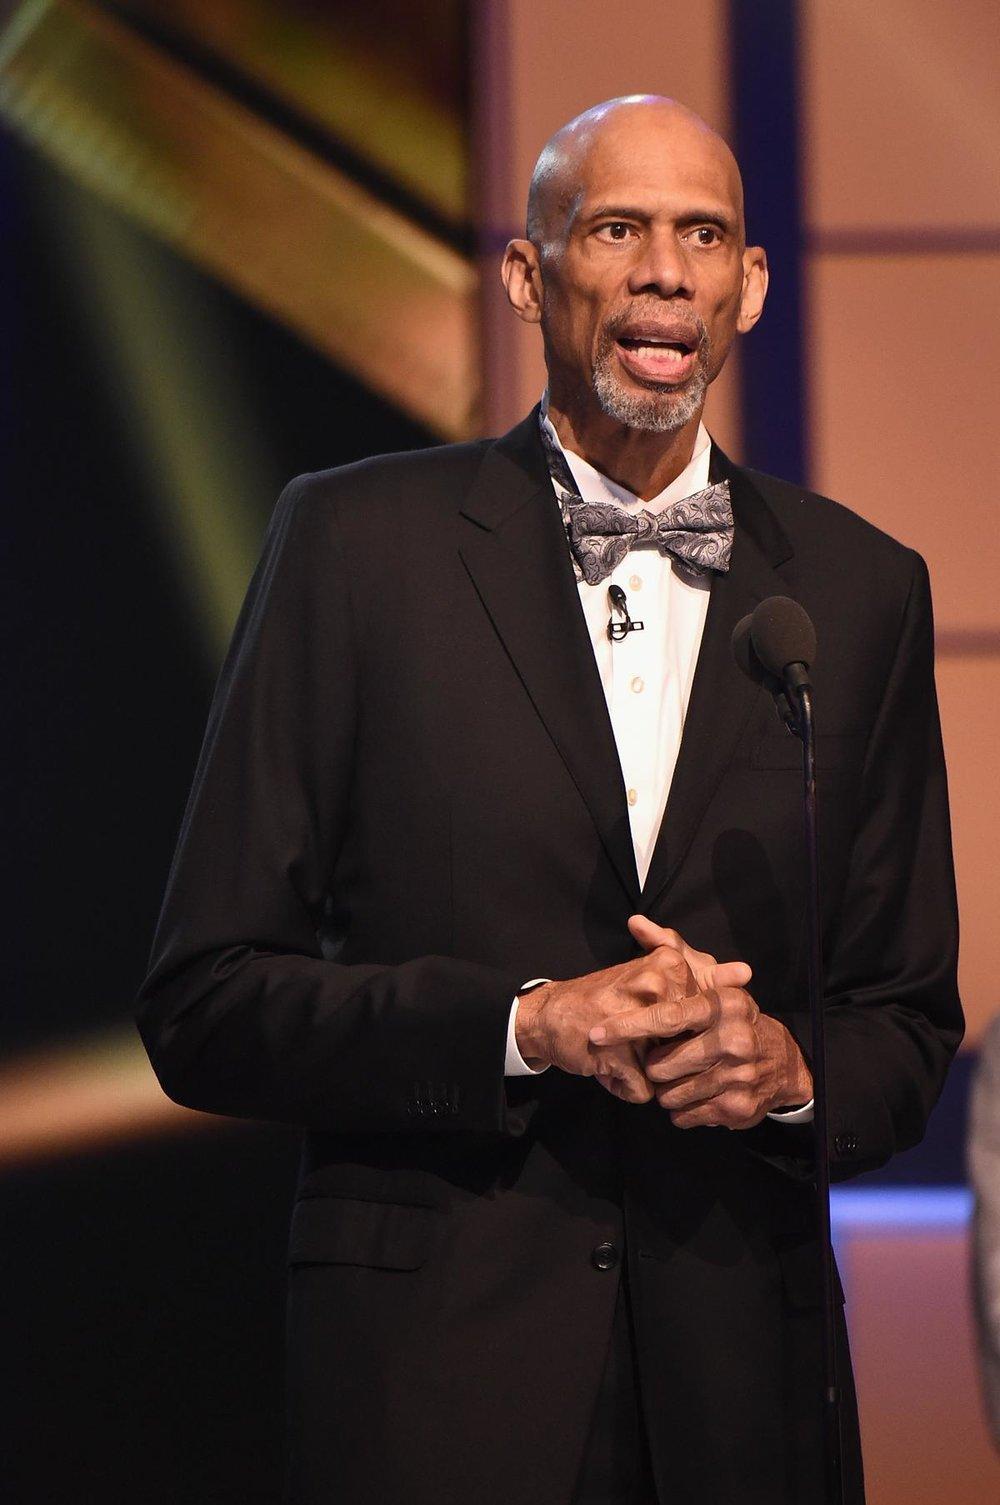 NBA Legend Kareem Abdul-Jabbar